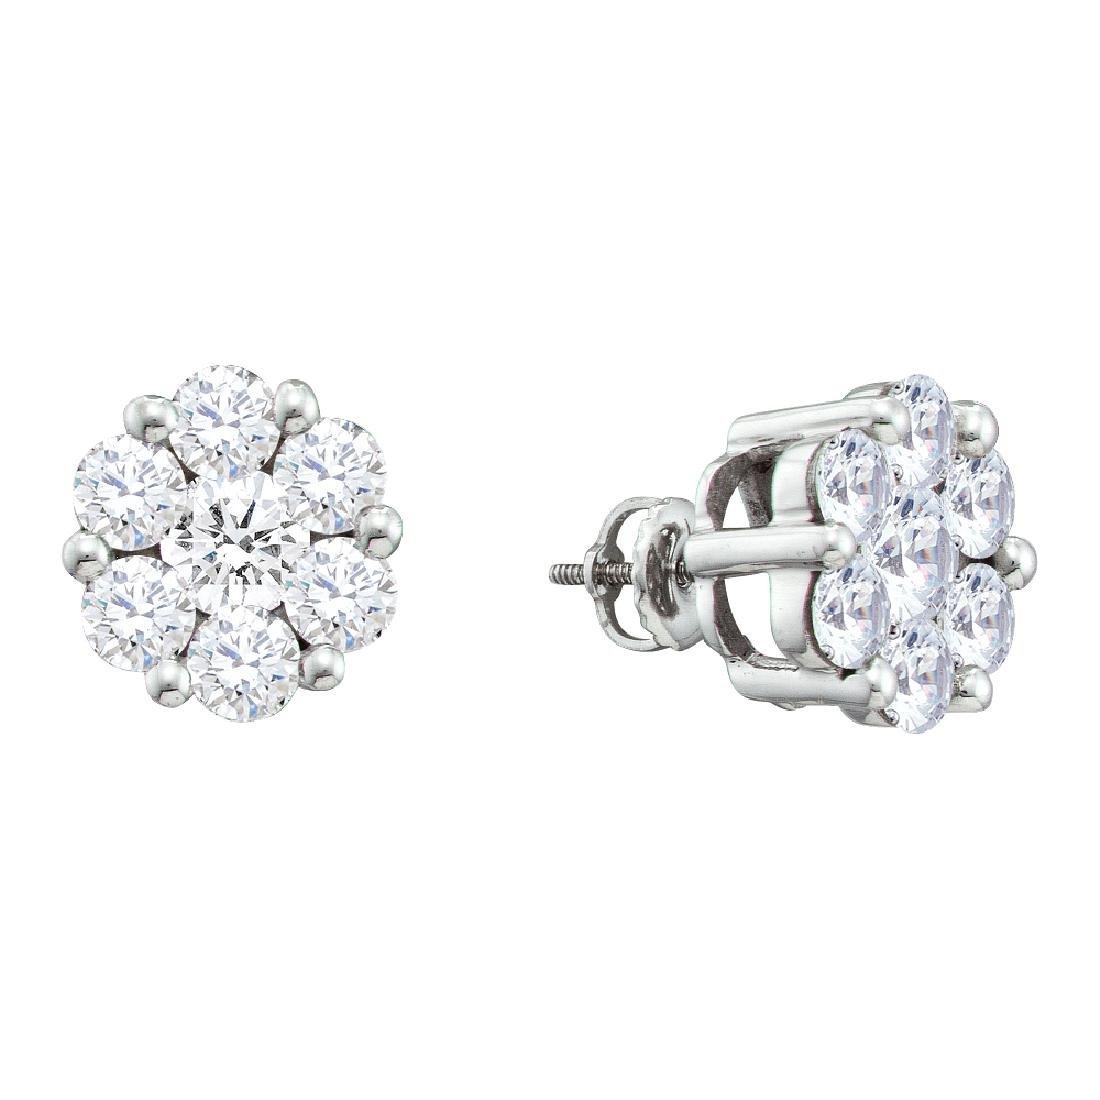 0.5 CTW Natural Diamond Flower Cluster Stud Earrings